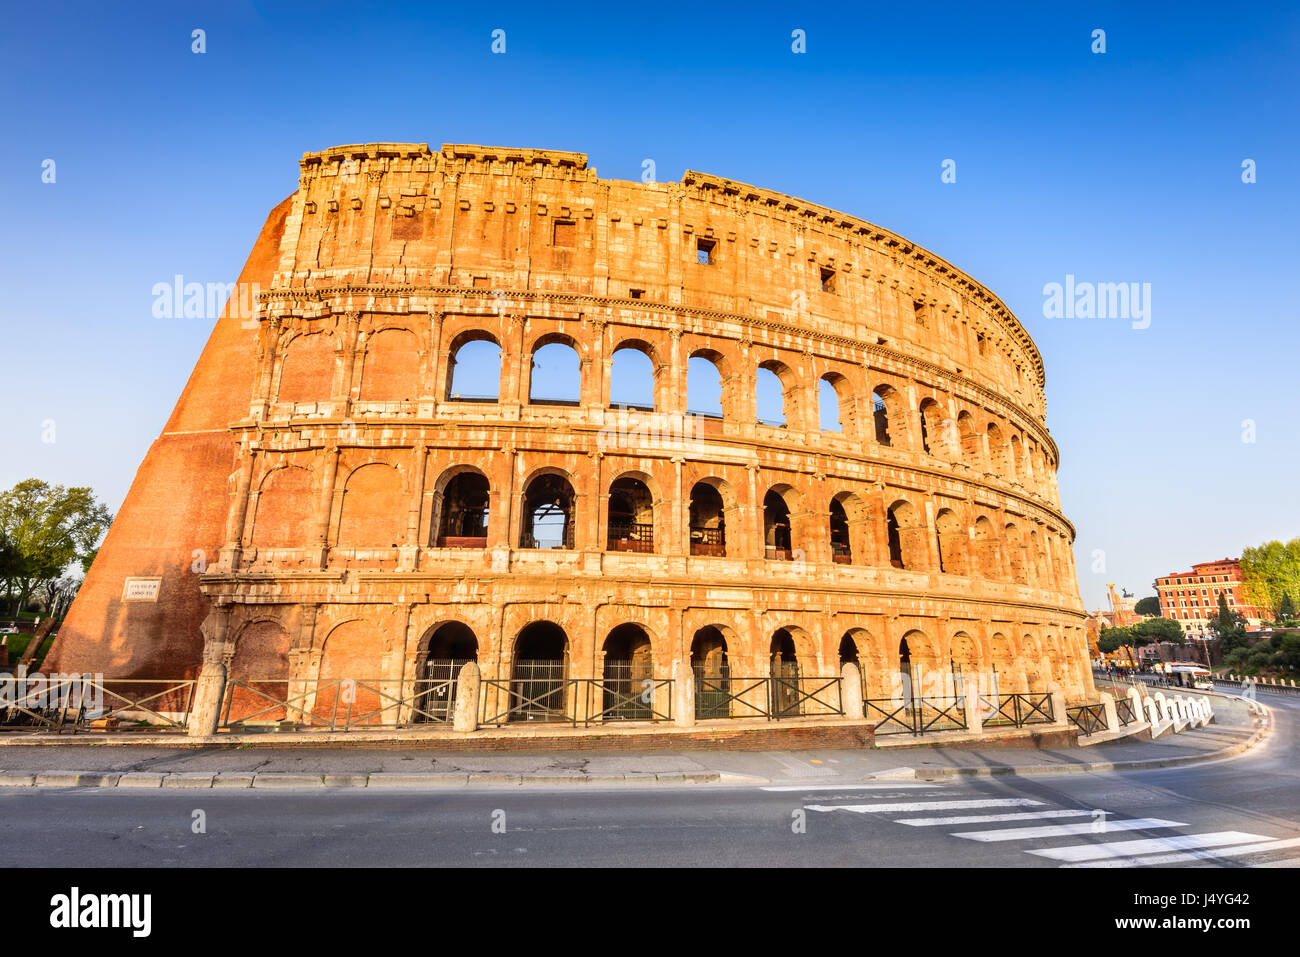 Rome, Italy. Colosseum in Roma, Italia. Symbol of the ancient city. Amphitheatre in sunrise light. - Stock Image